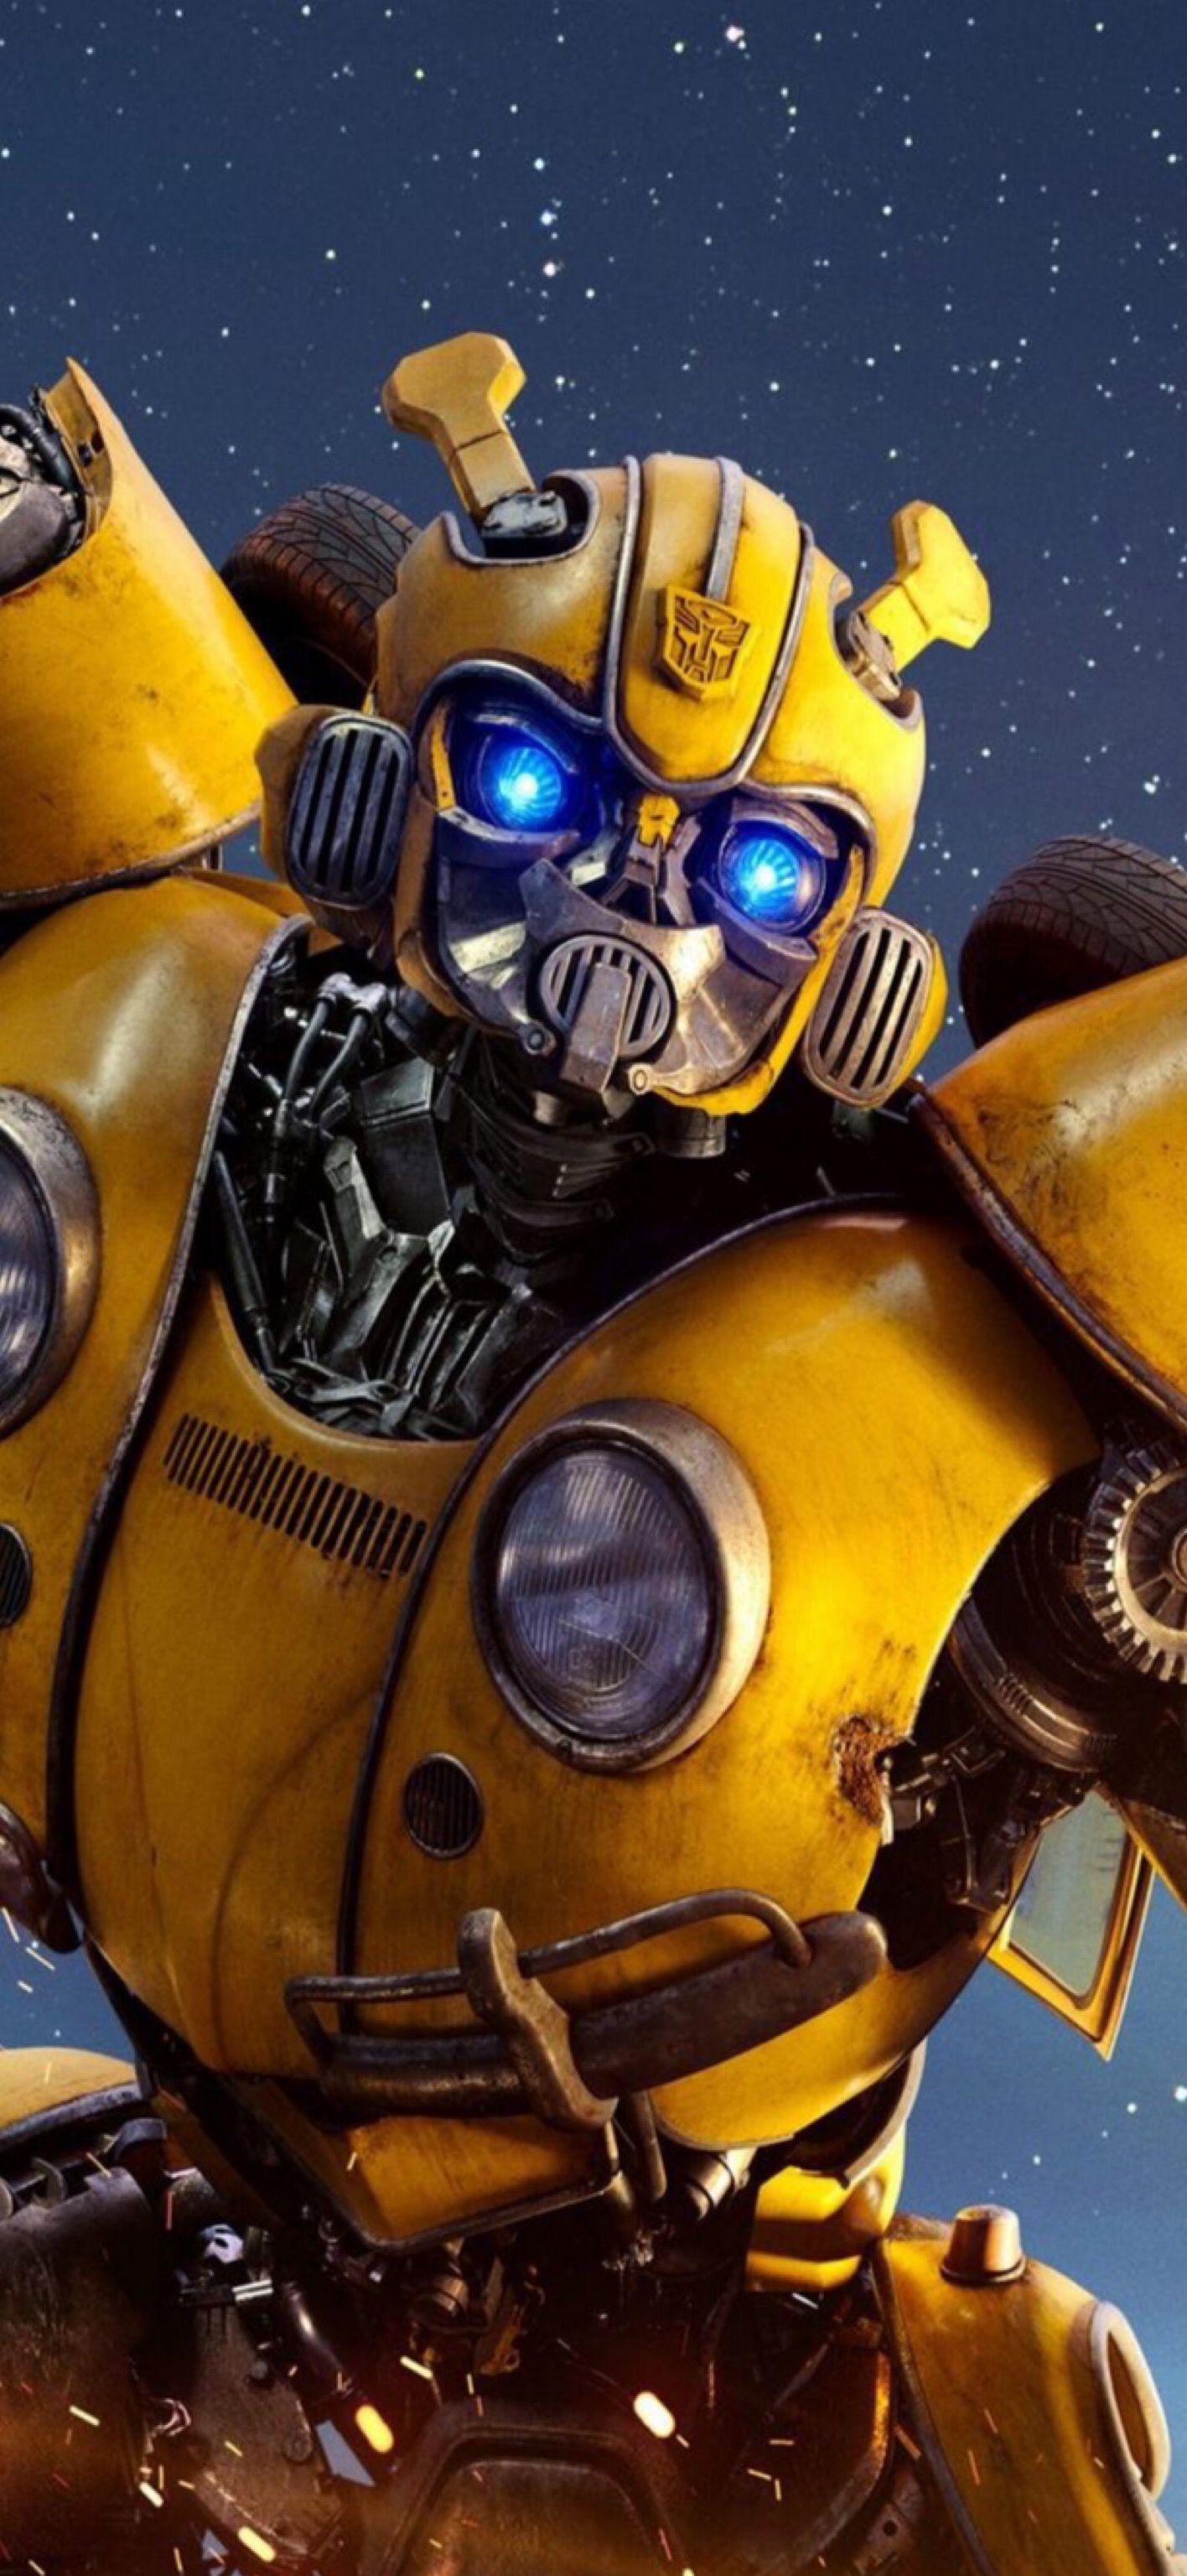 Wallpaper Transformer Bumblebee - Resized Iphone X Ben